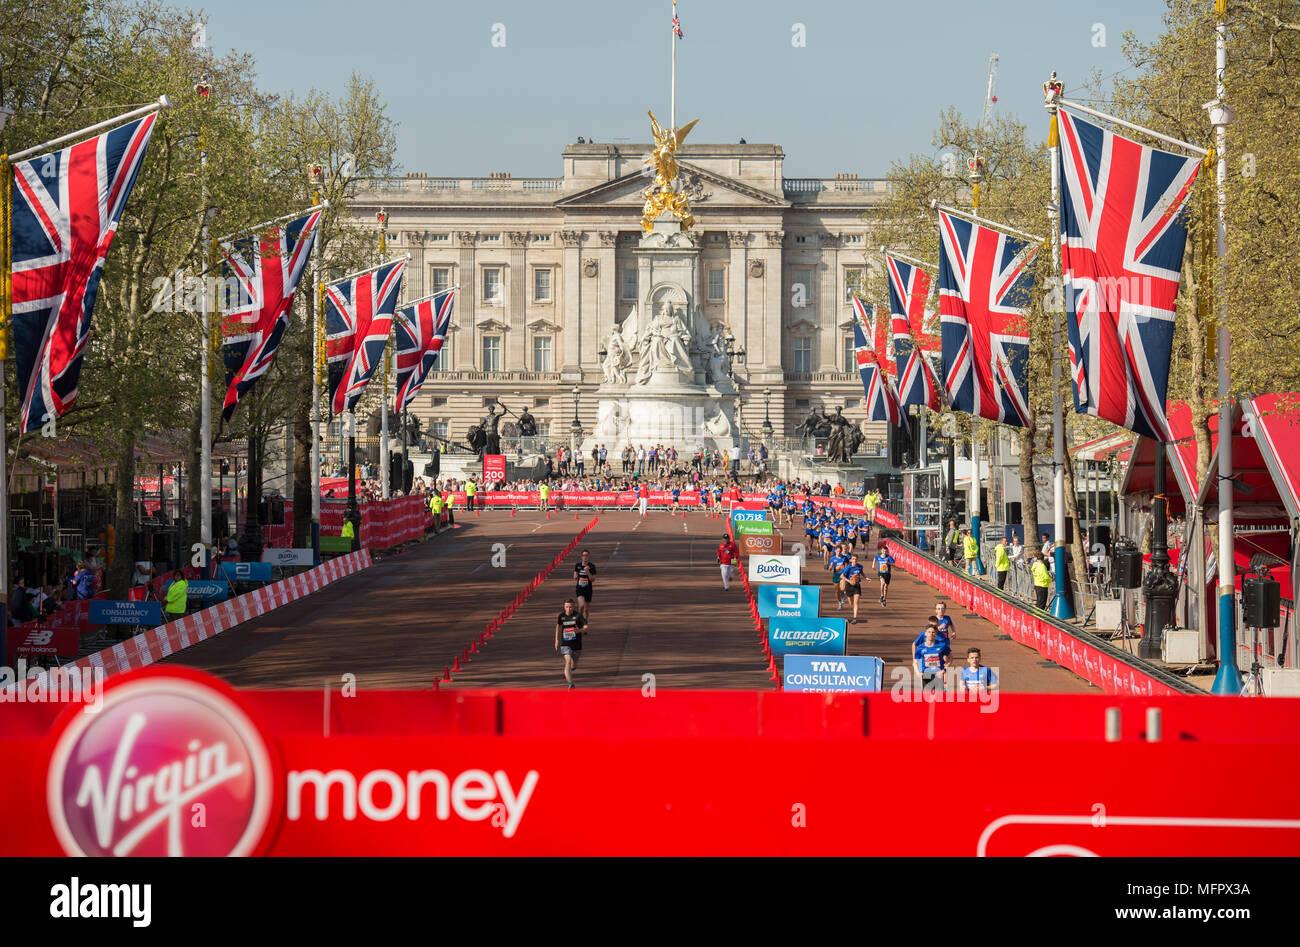 22 April 2018, The Mall, London UK. Junior runners on the finishing straight of the Virgin Money London Marathon 2018 circuit. - Stock Image